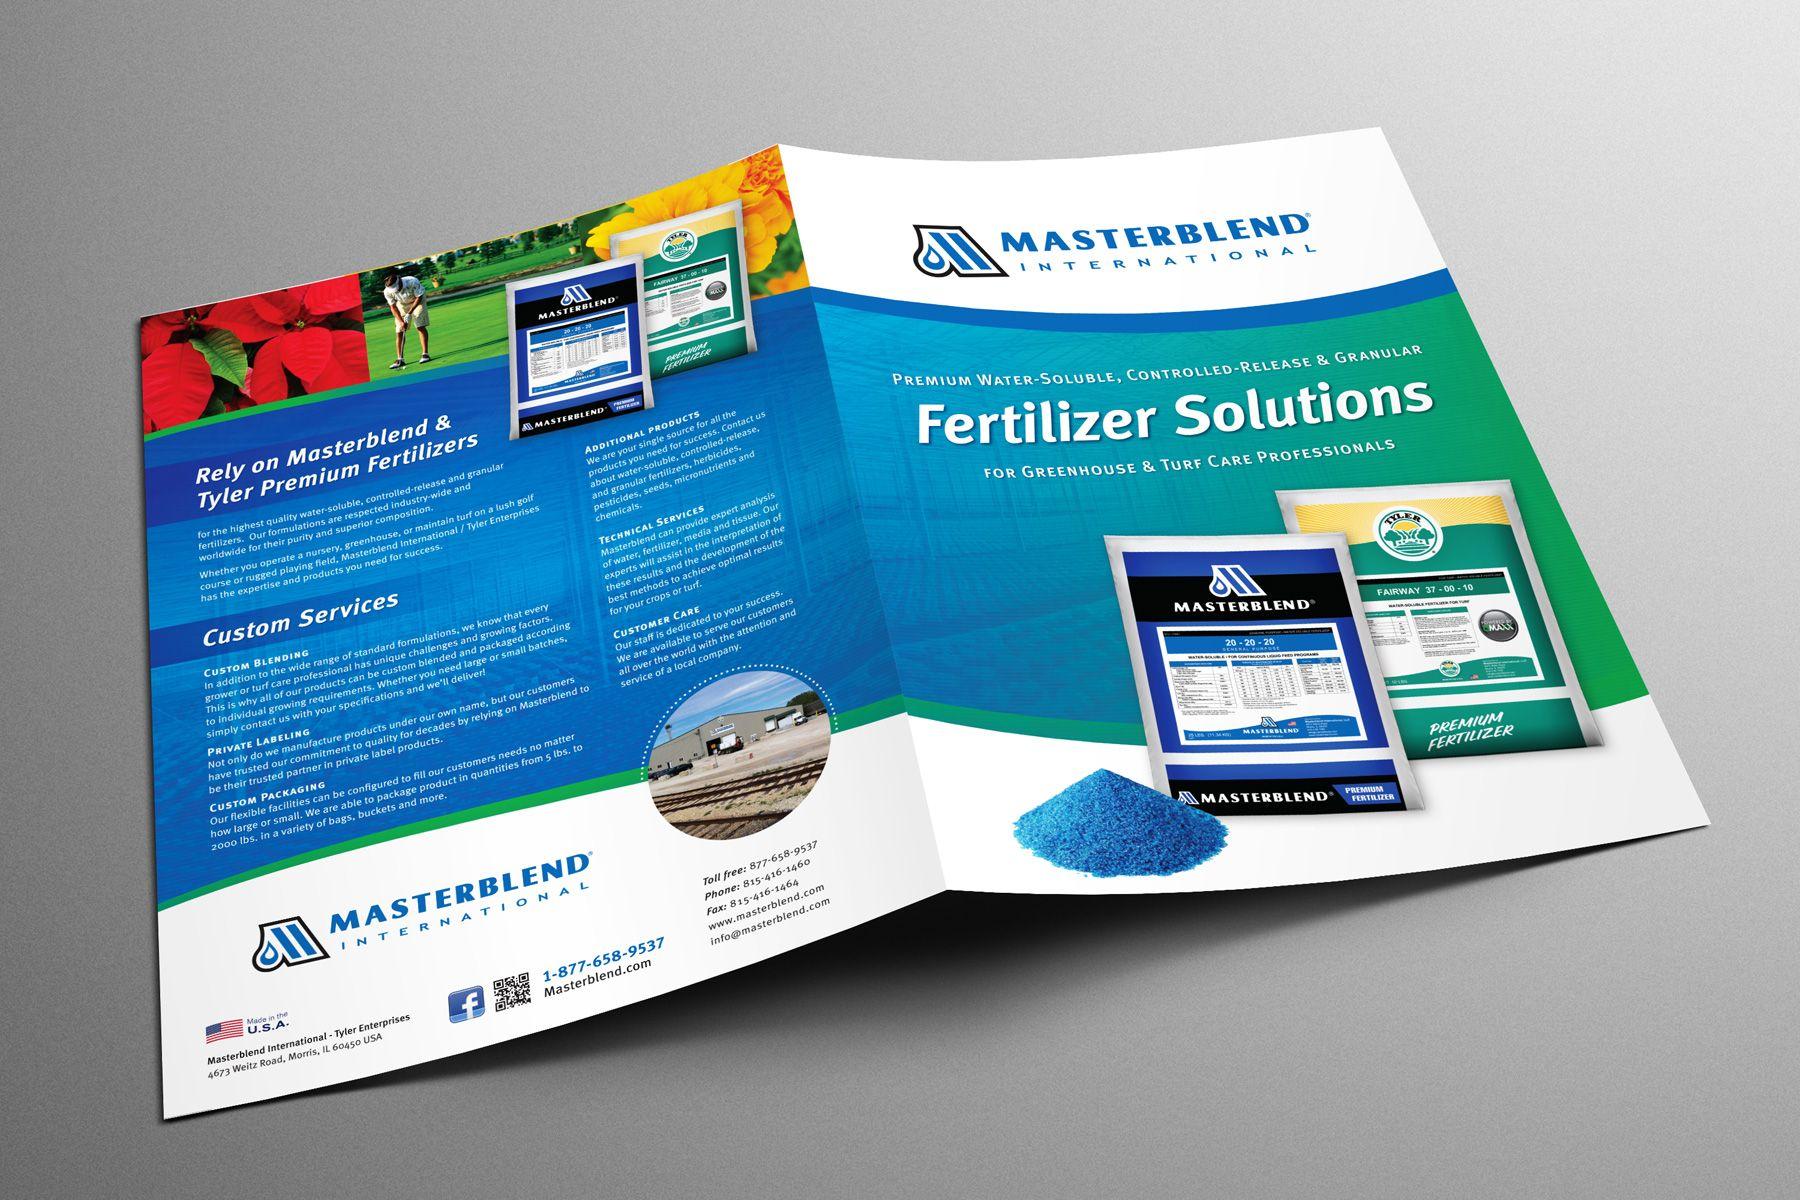 Masterblend Fertilizer Solutions Brochure Masterblend